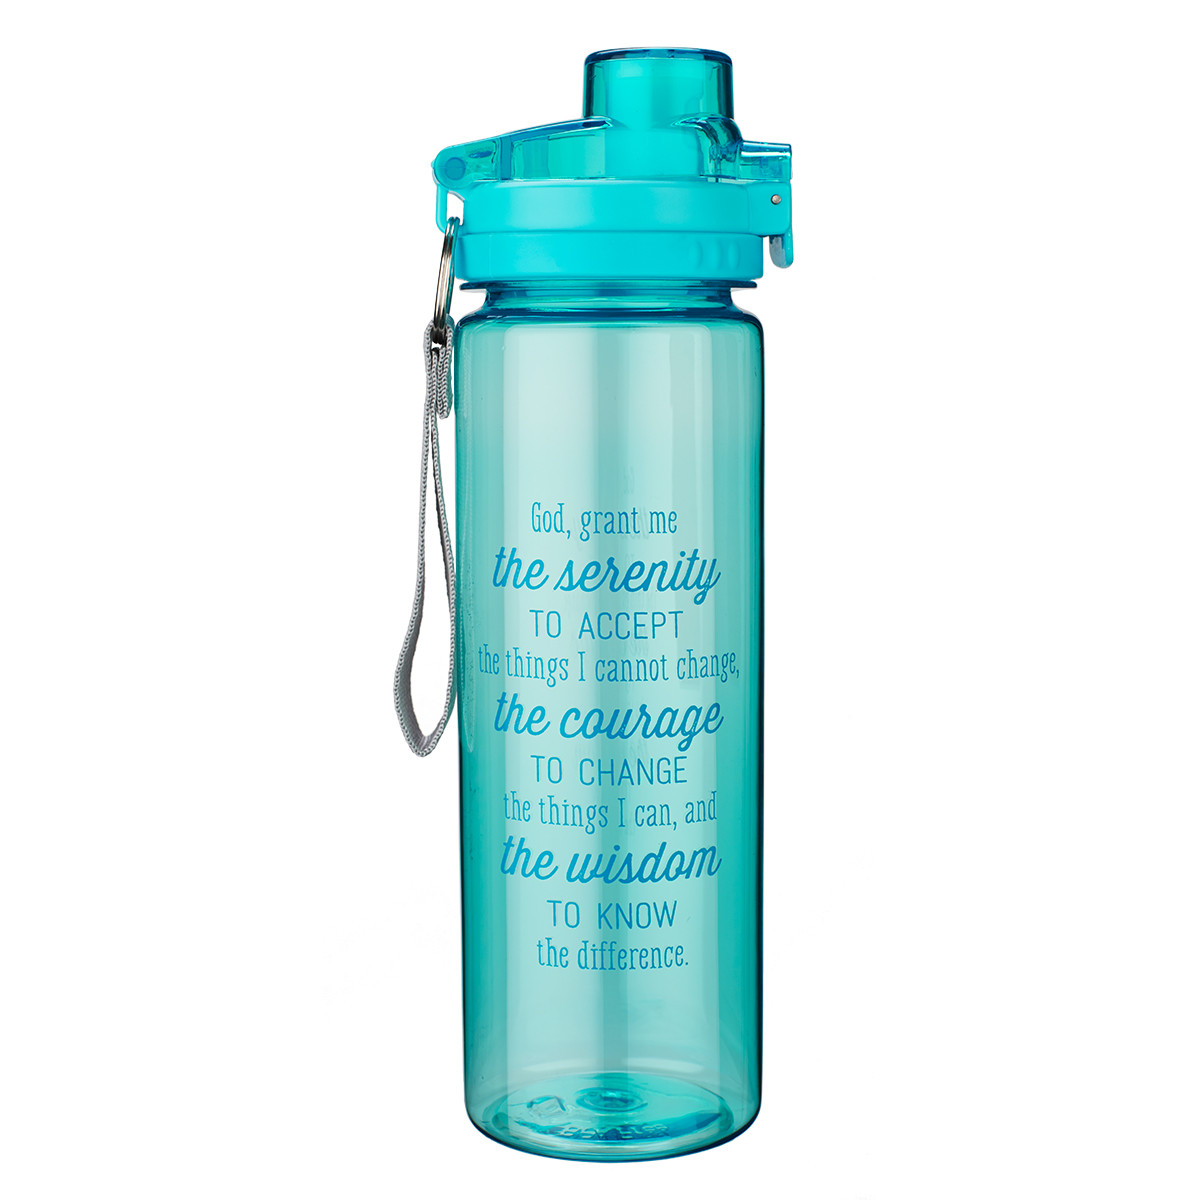 Water Bottle In Spanish: Plastic Water Bottle: Serenity Prayer In Aqua Blue